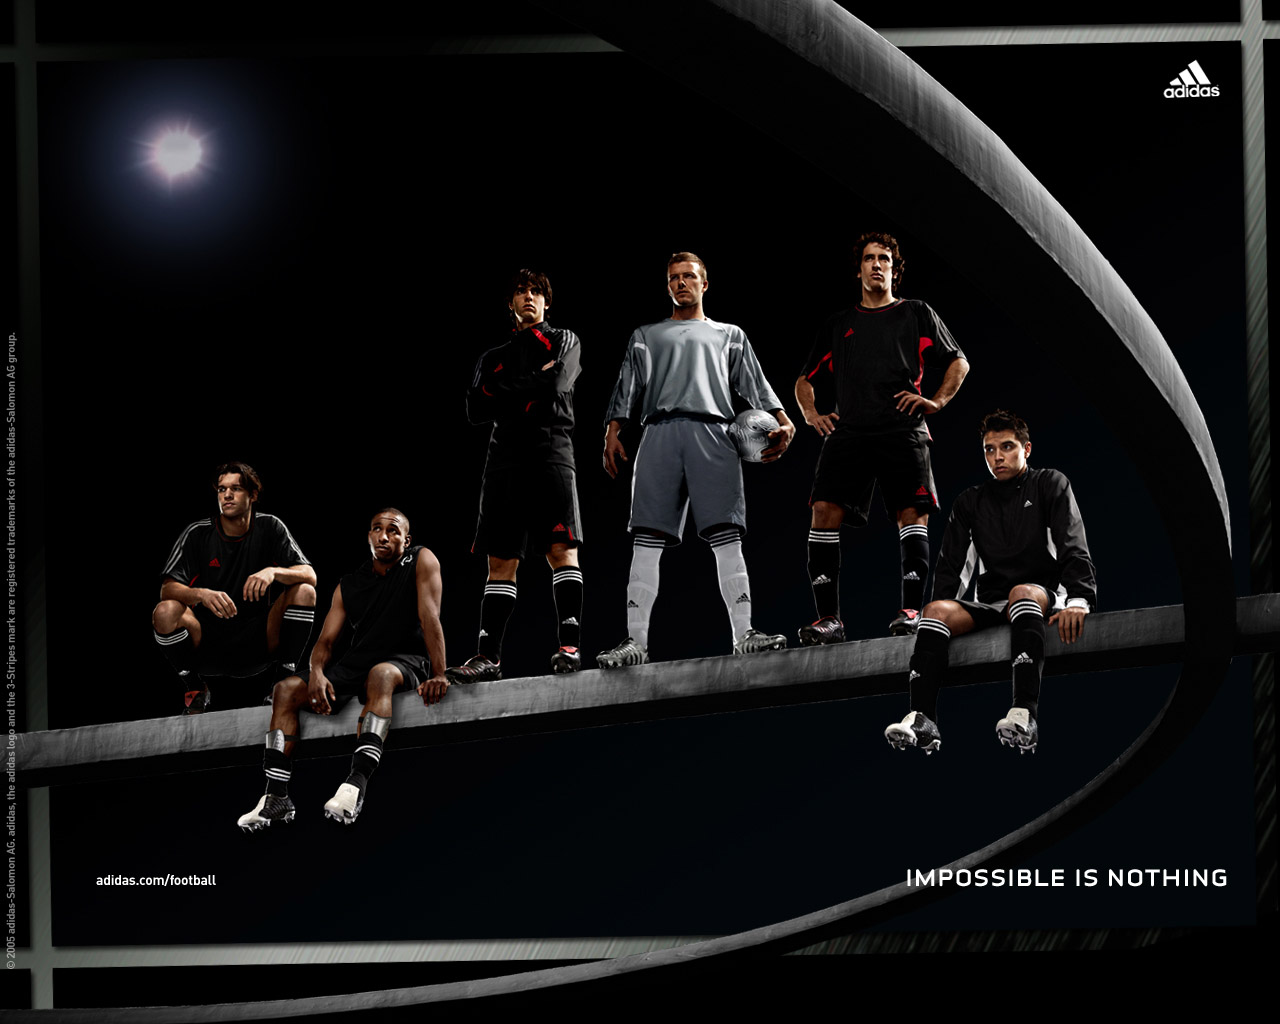 Nike Football Wallpaper